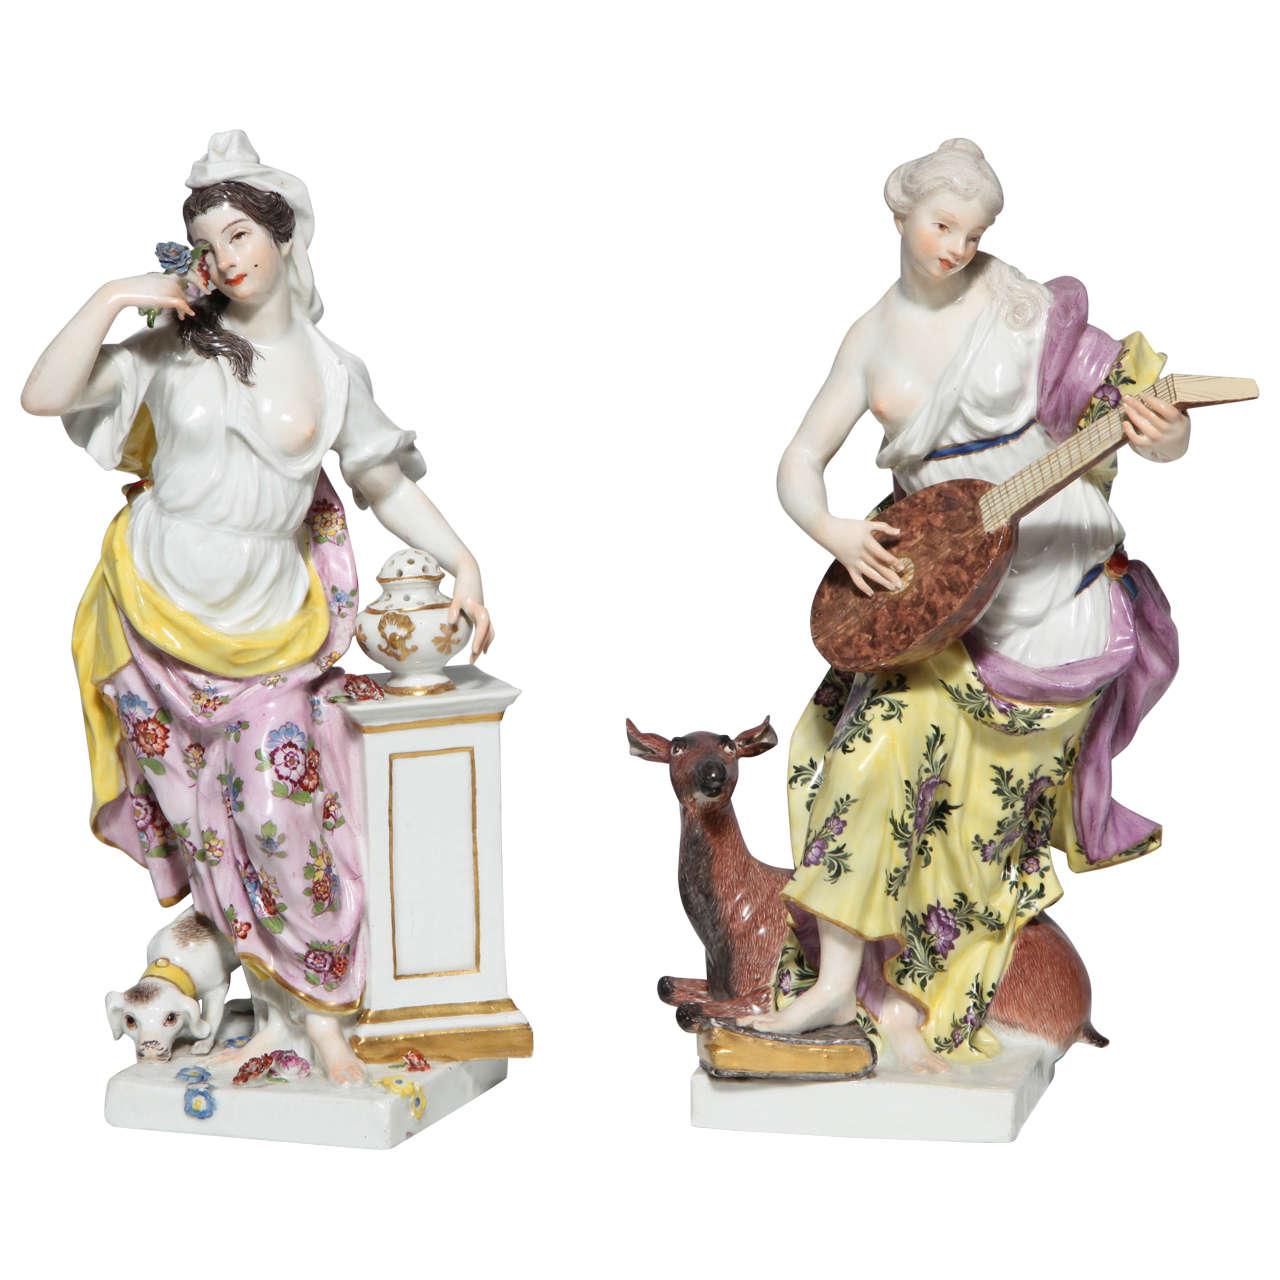 Pair of 18th Century Meissen Porcelain Figurines of the Sense